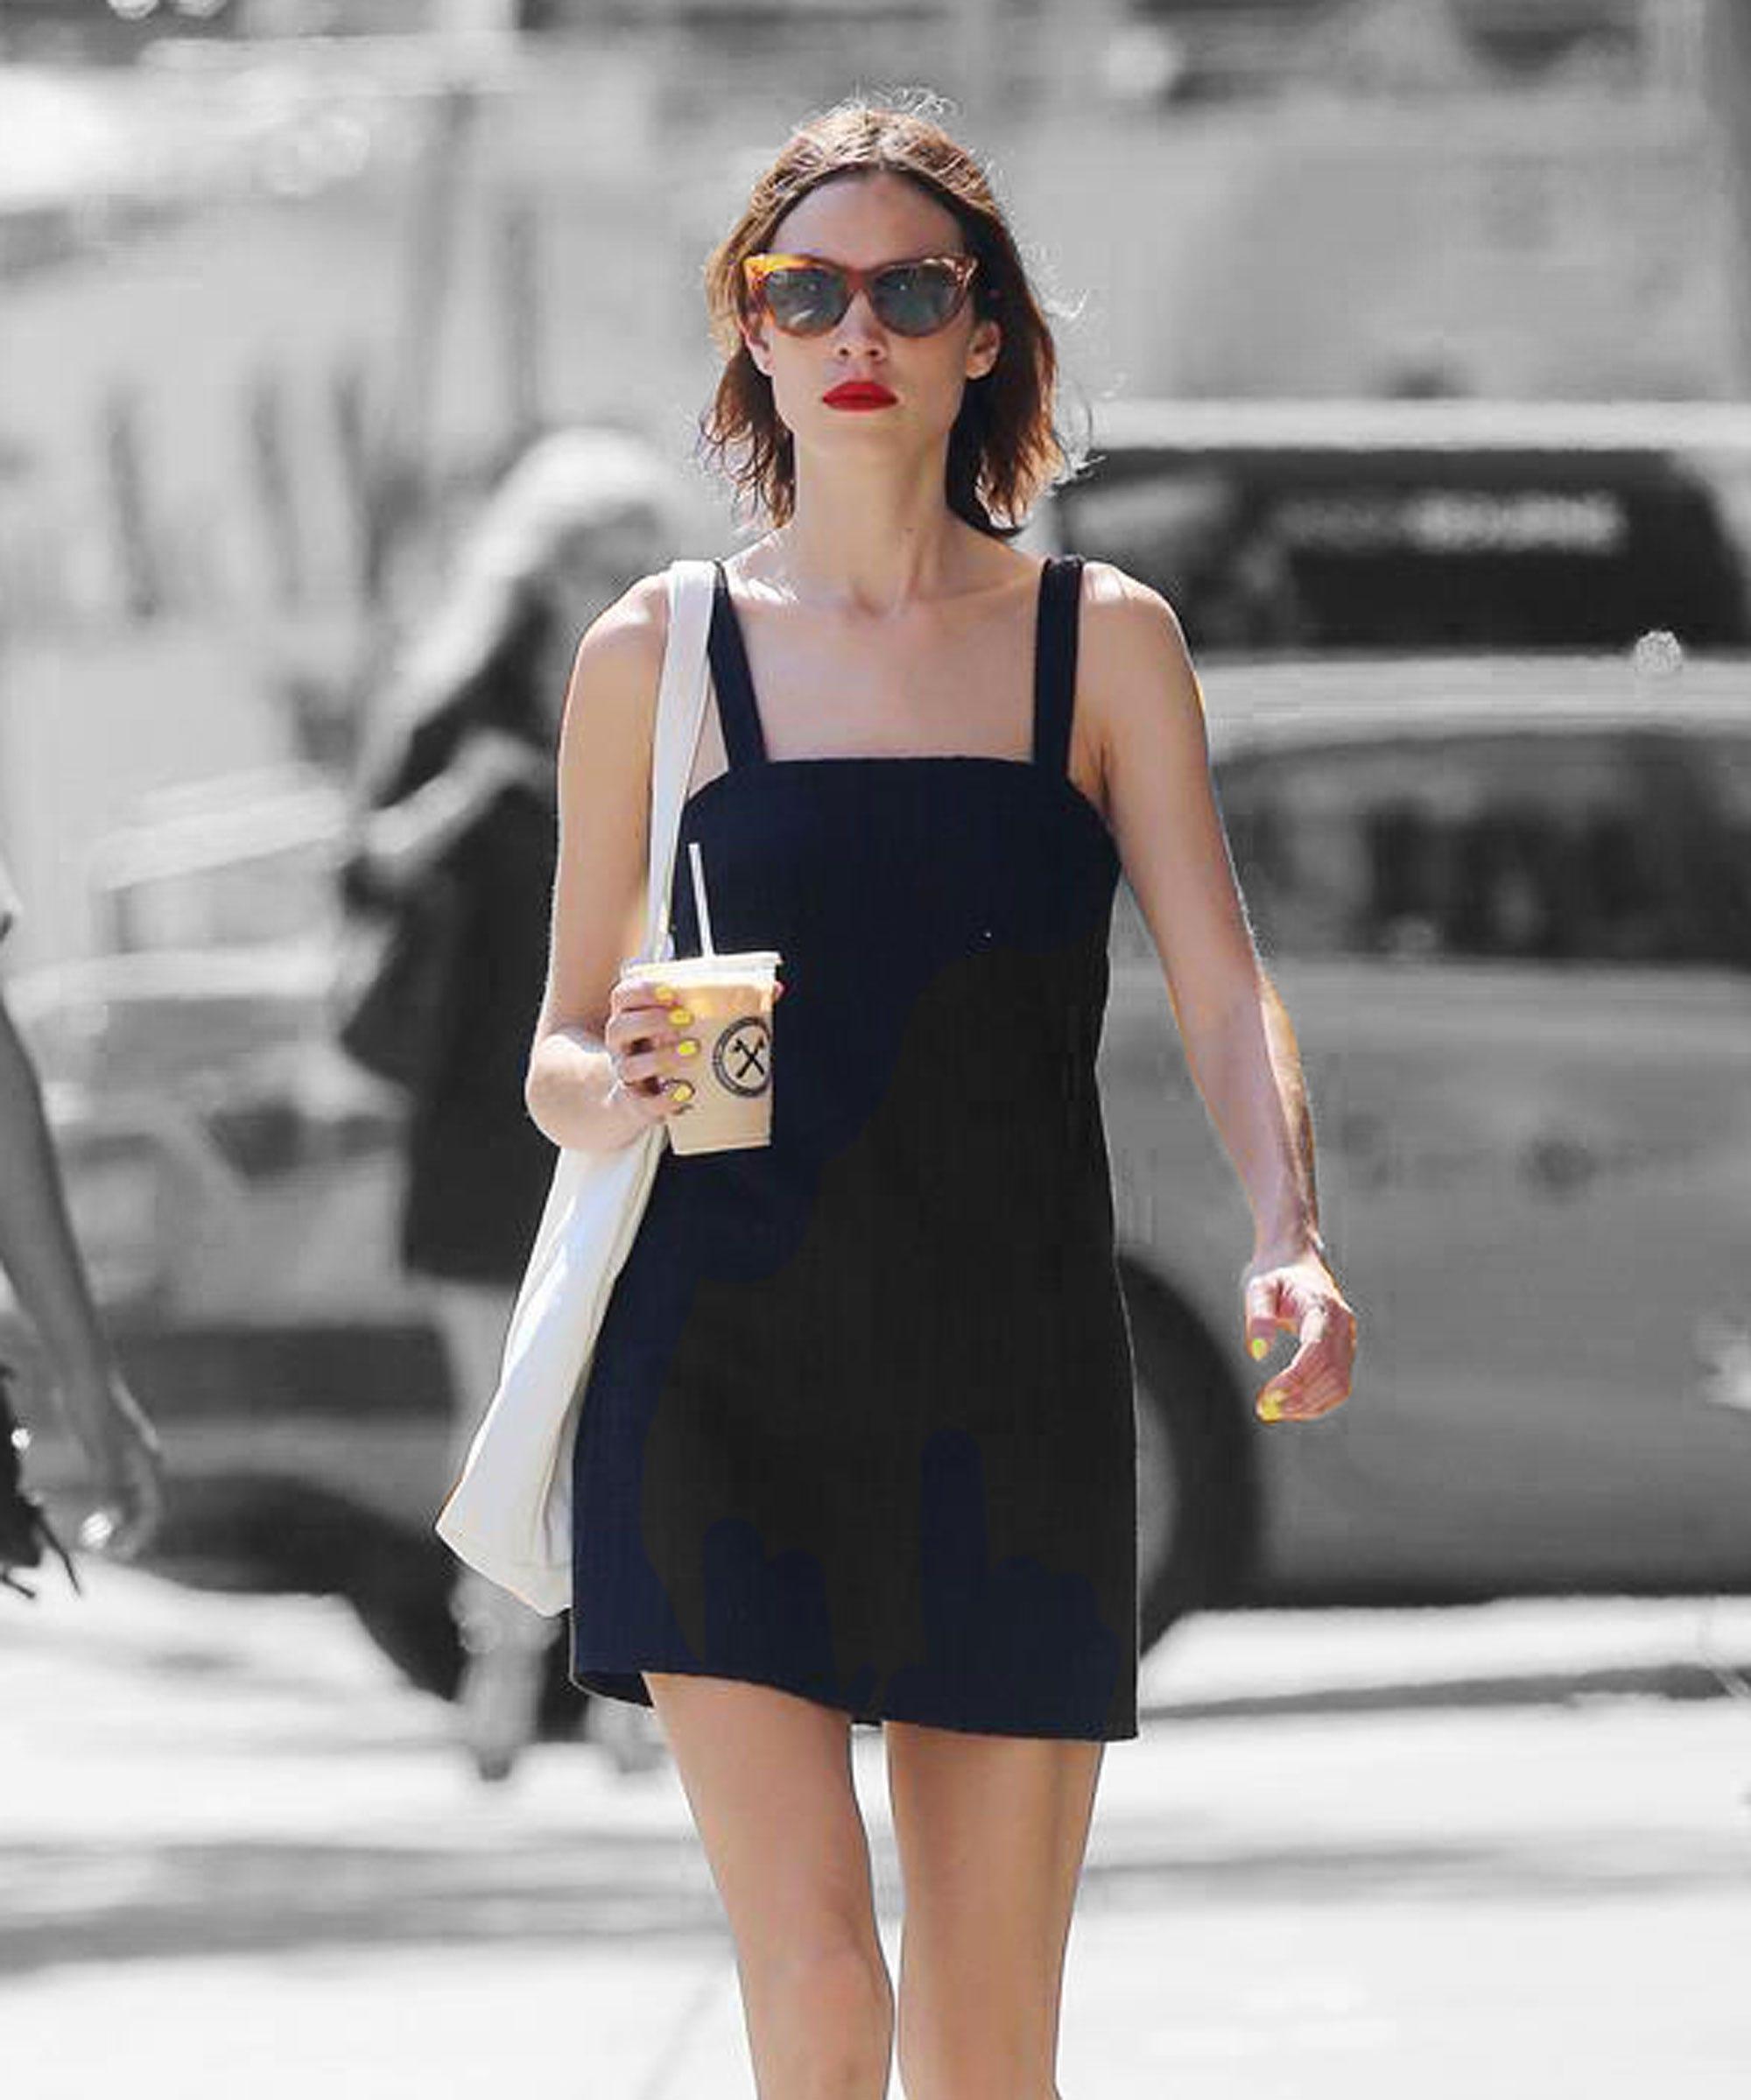 Alexa Chung , Summer Outfits, Fashion Girl Street Style